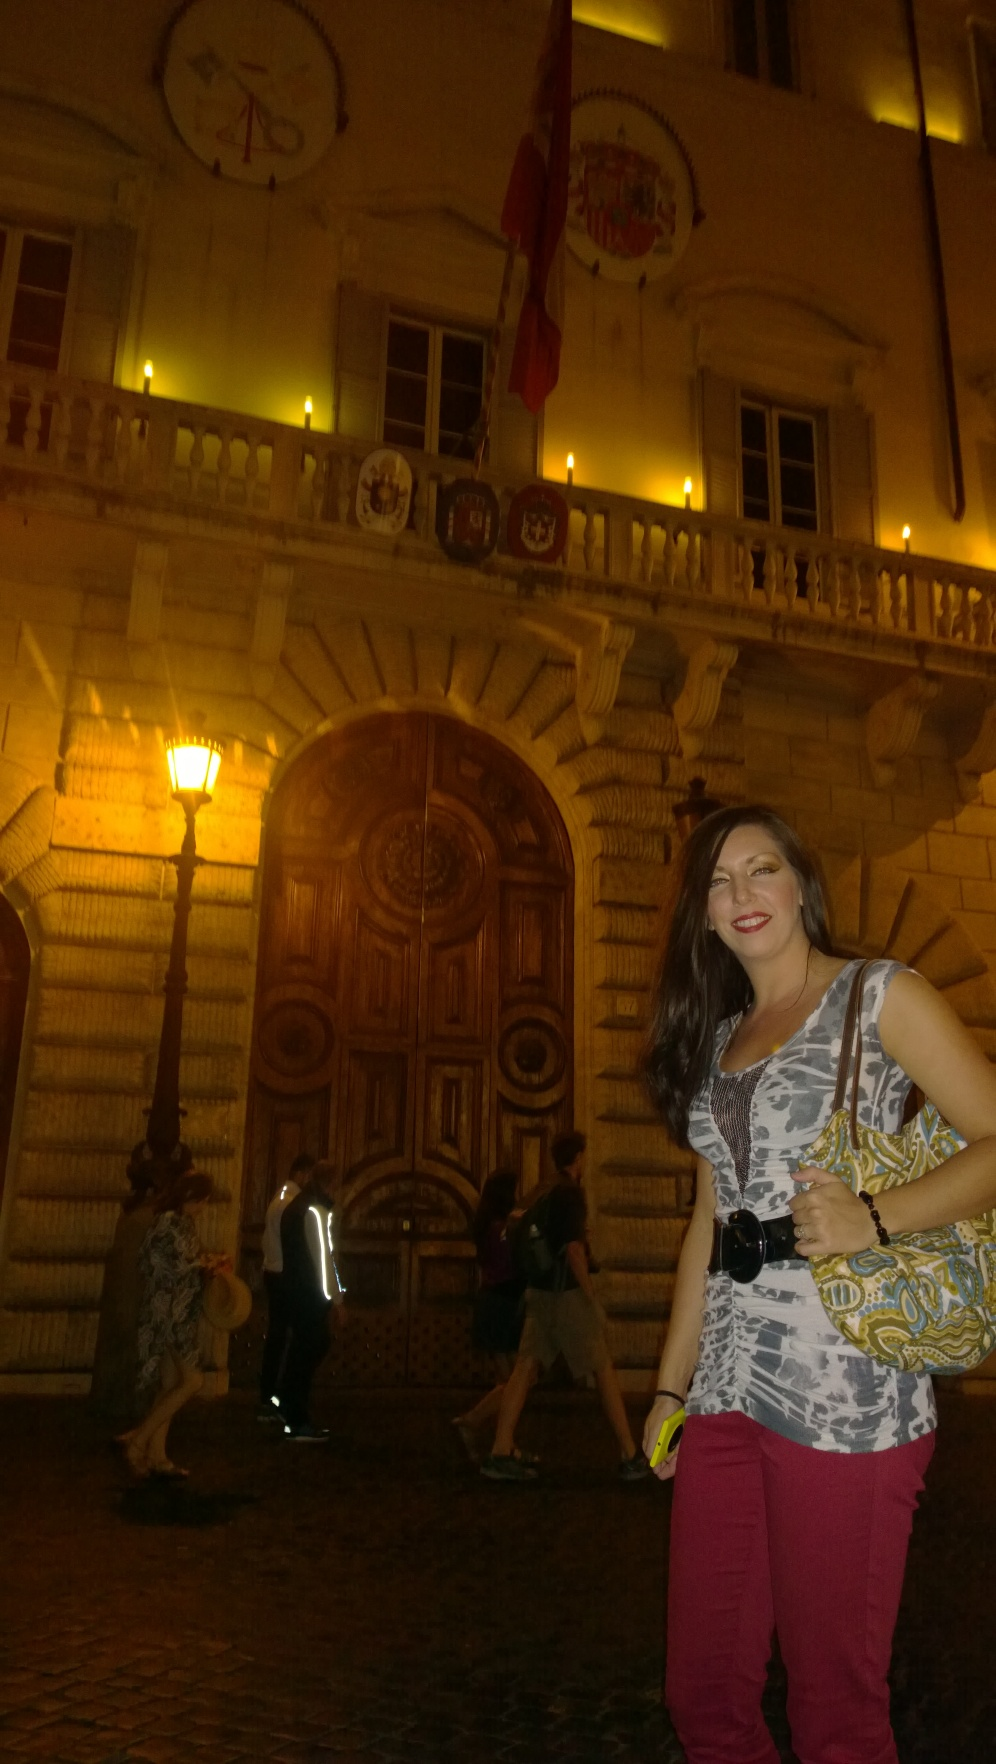 Cool old doorway in Rome